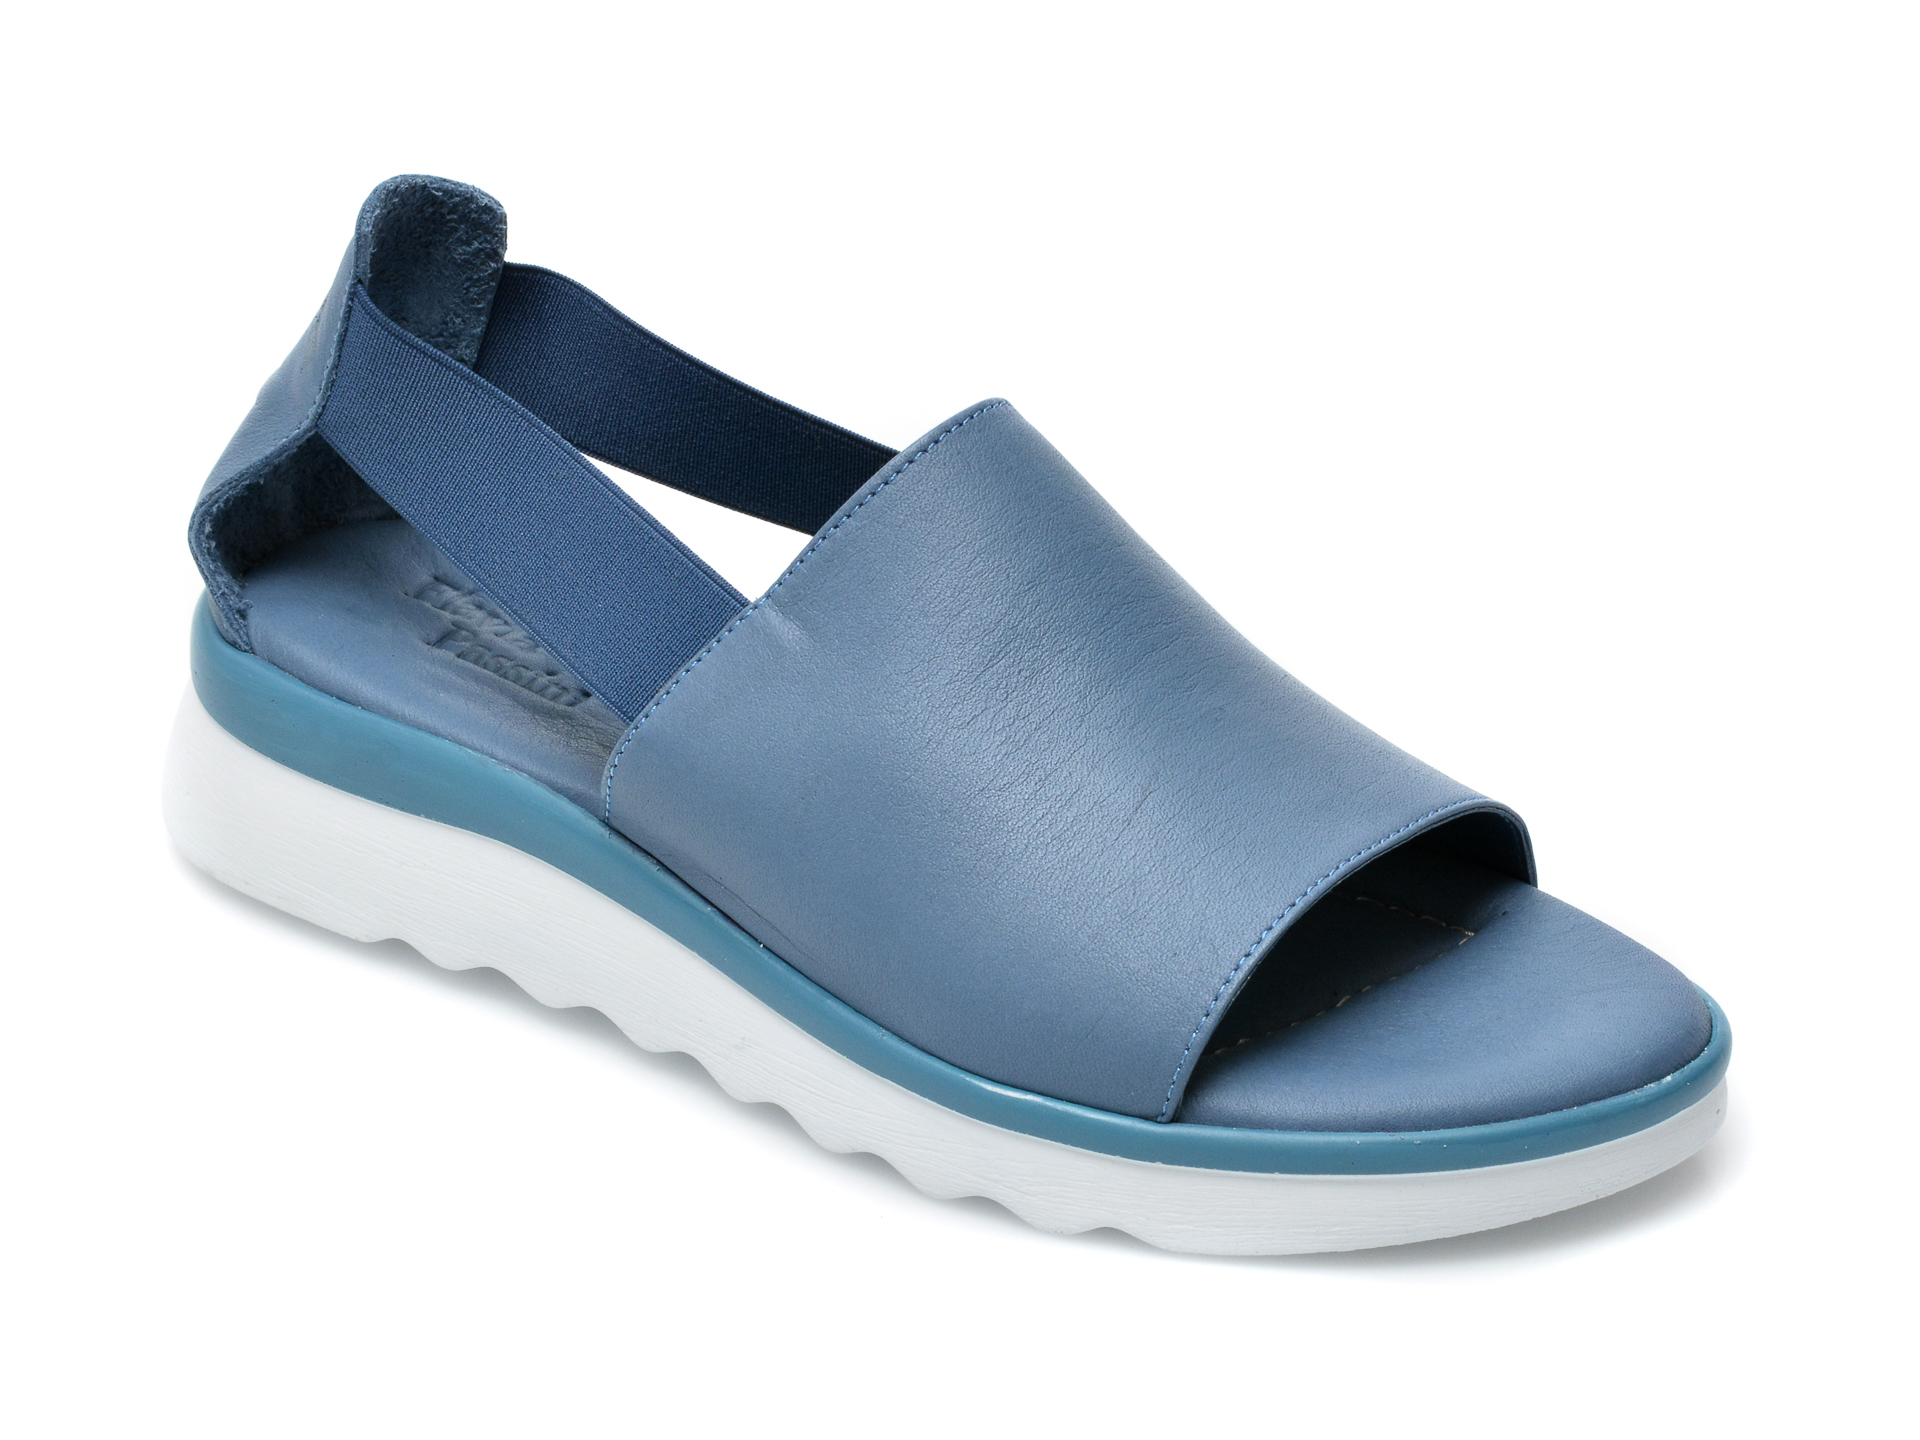 Sandale FLAVIA PASSINI albastre, EI24501, din piele naturala imagine otter.ro 2021